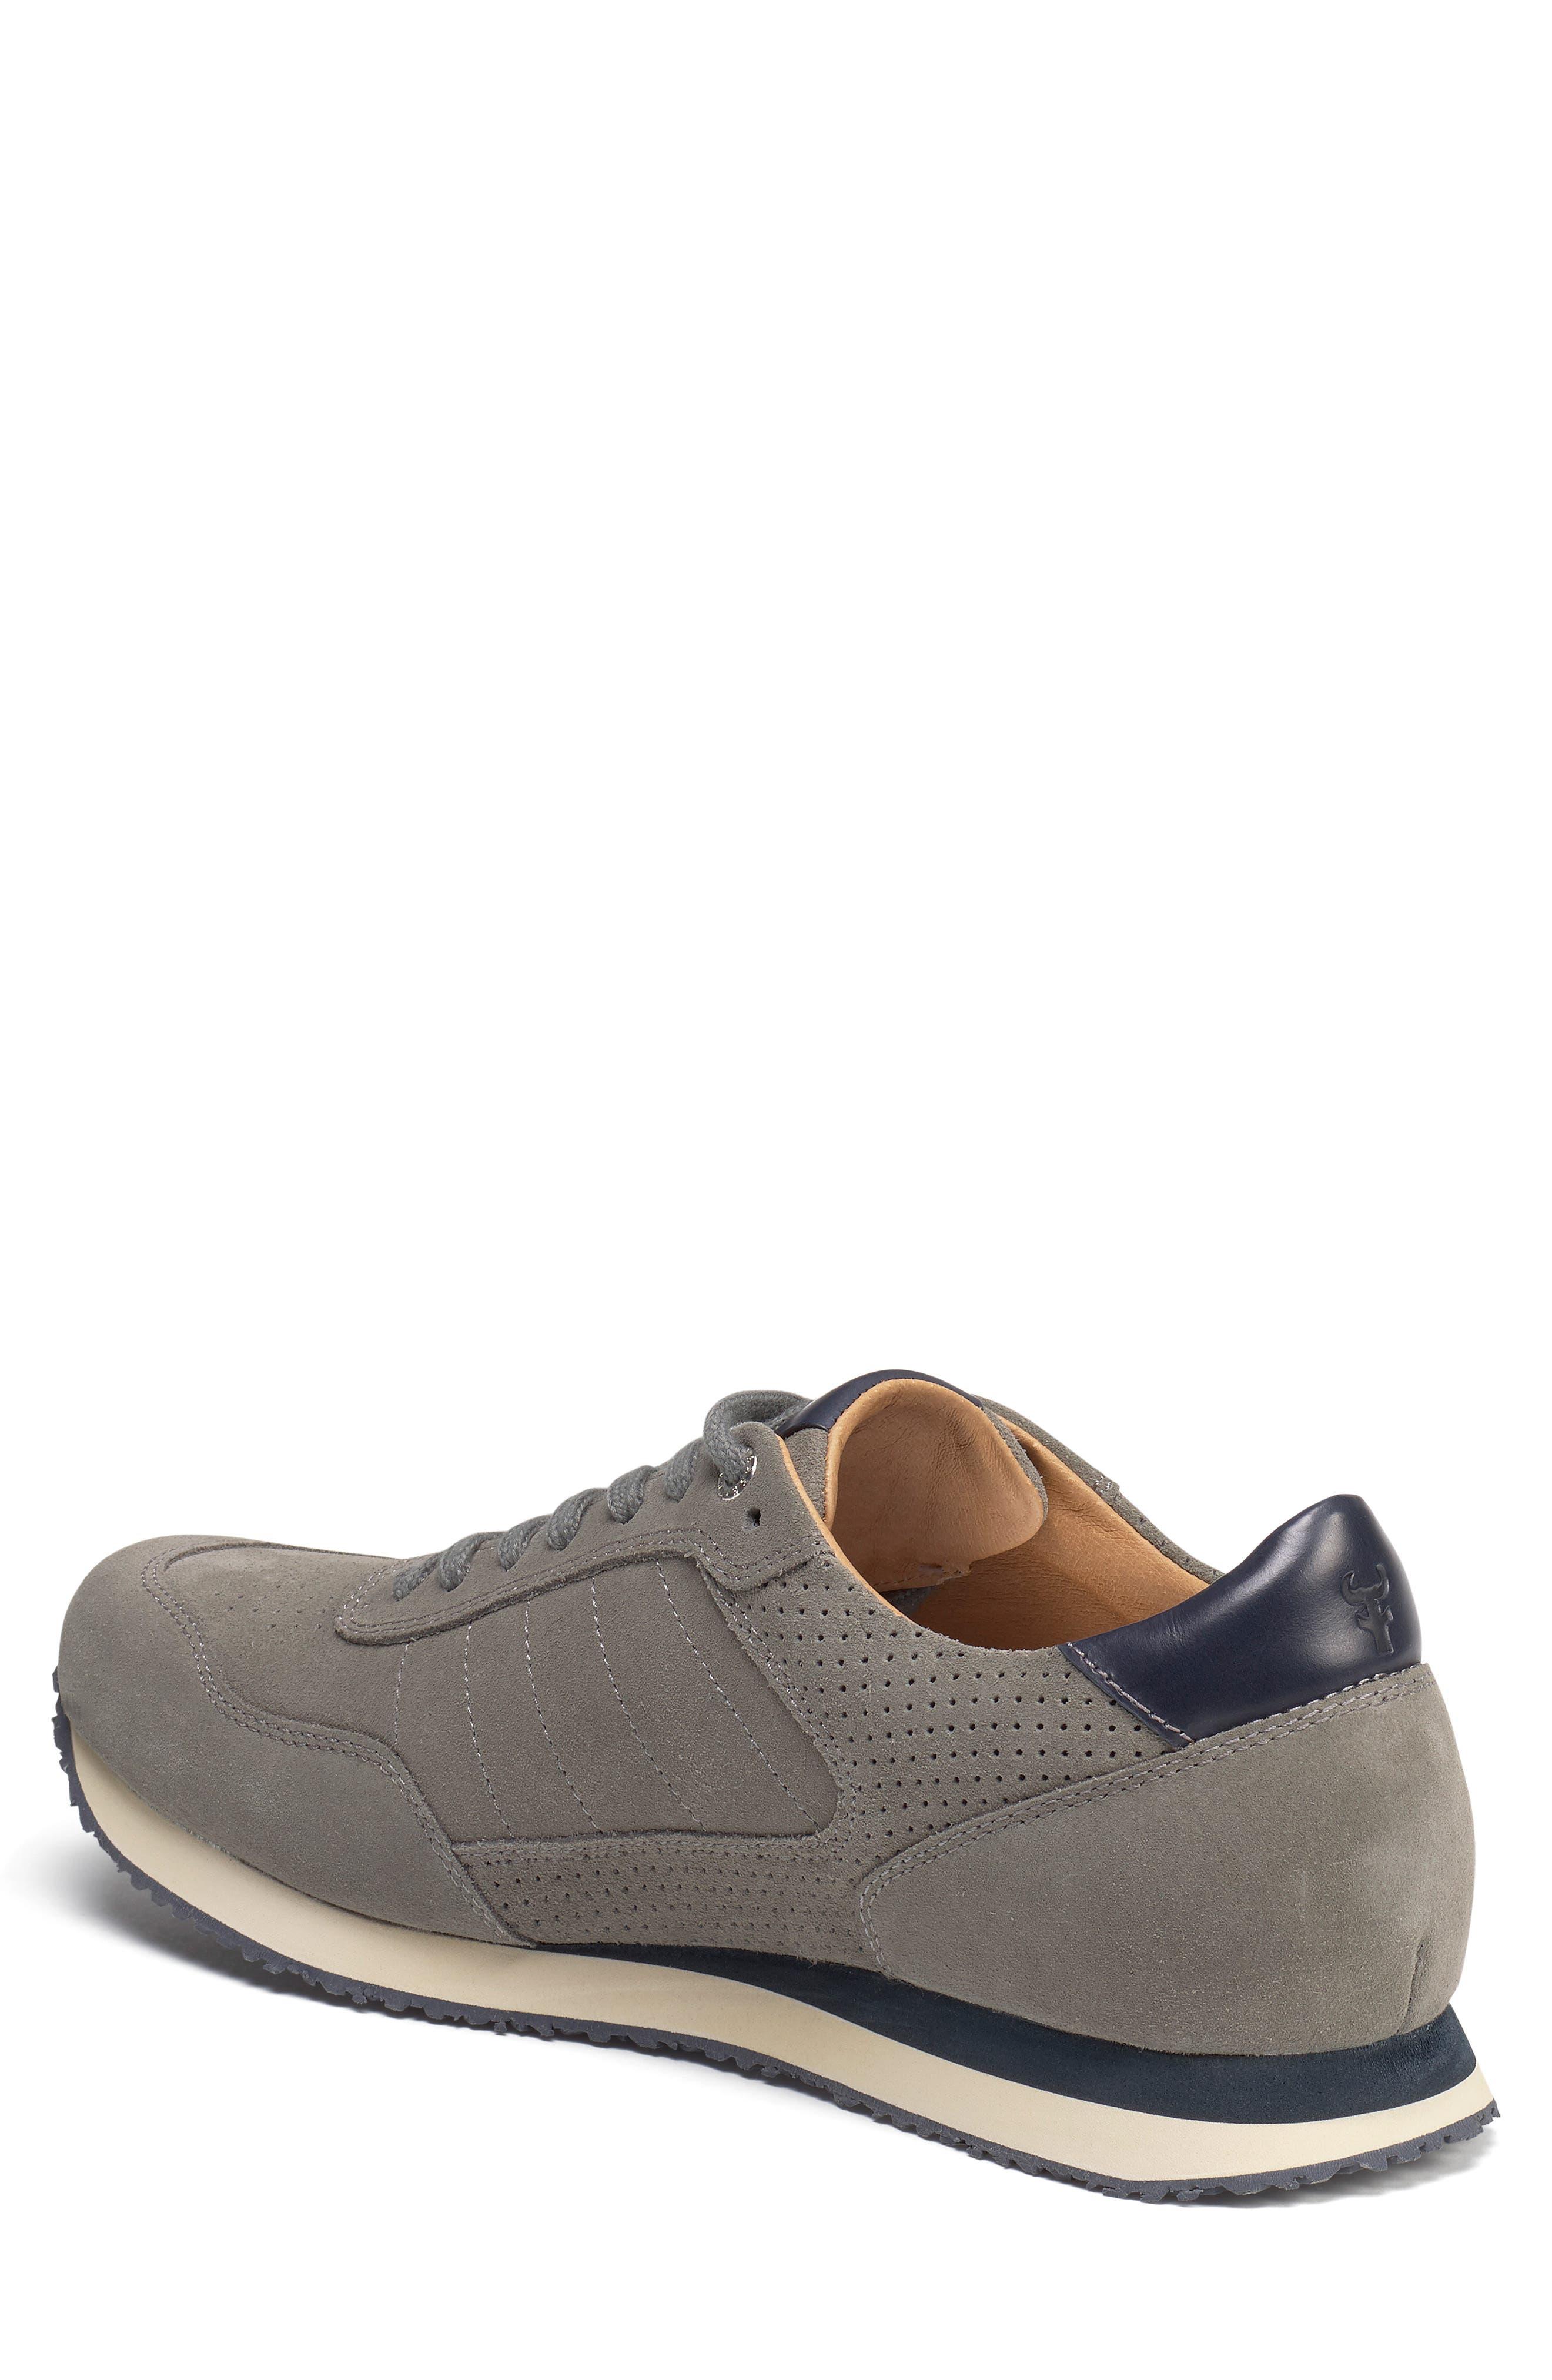 Aiden Sneaker,                             Alternate thumbnail 2, color,                             GREY SUEDE